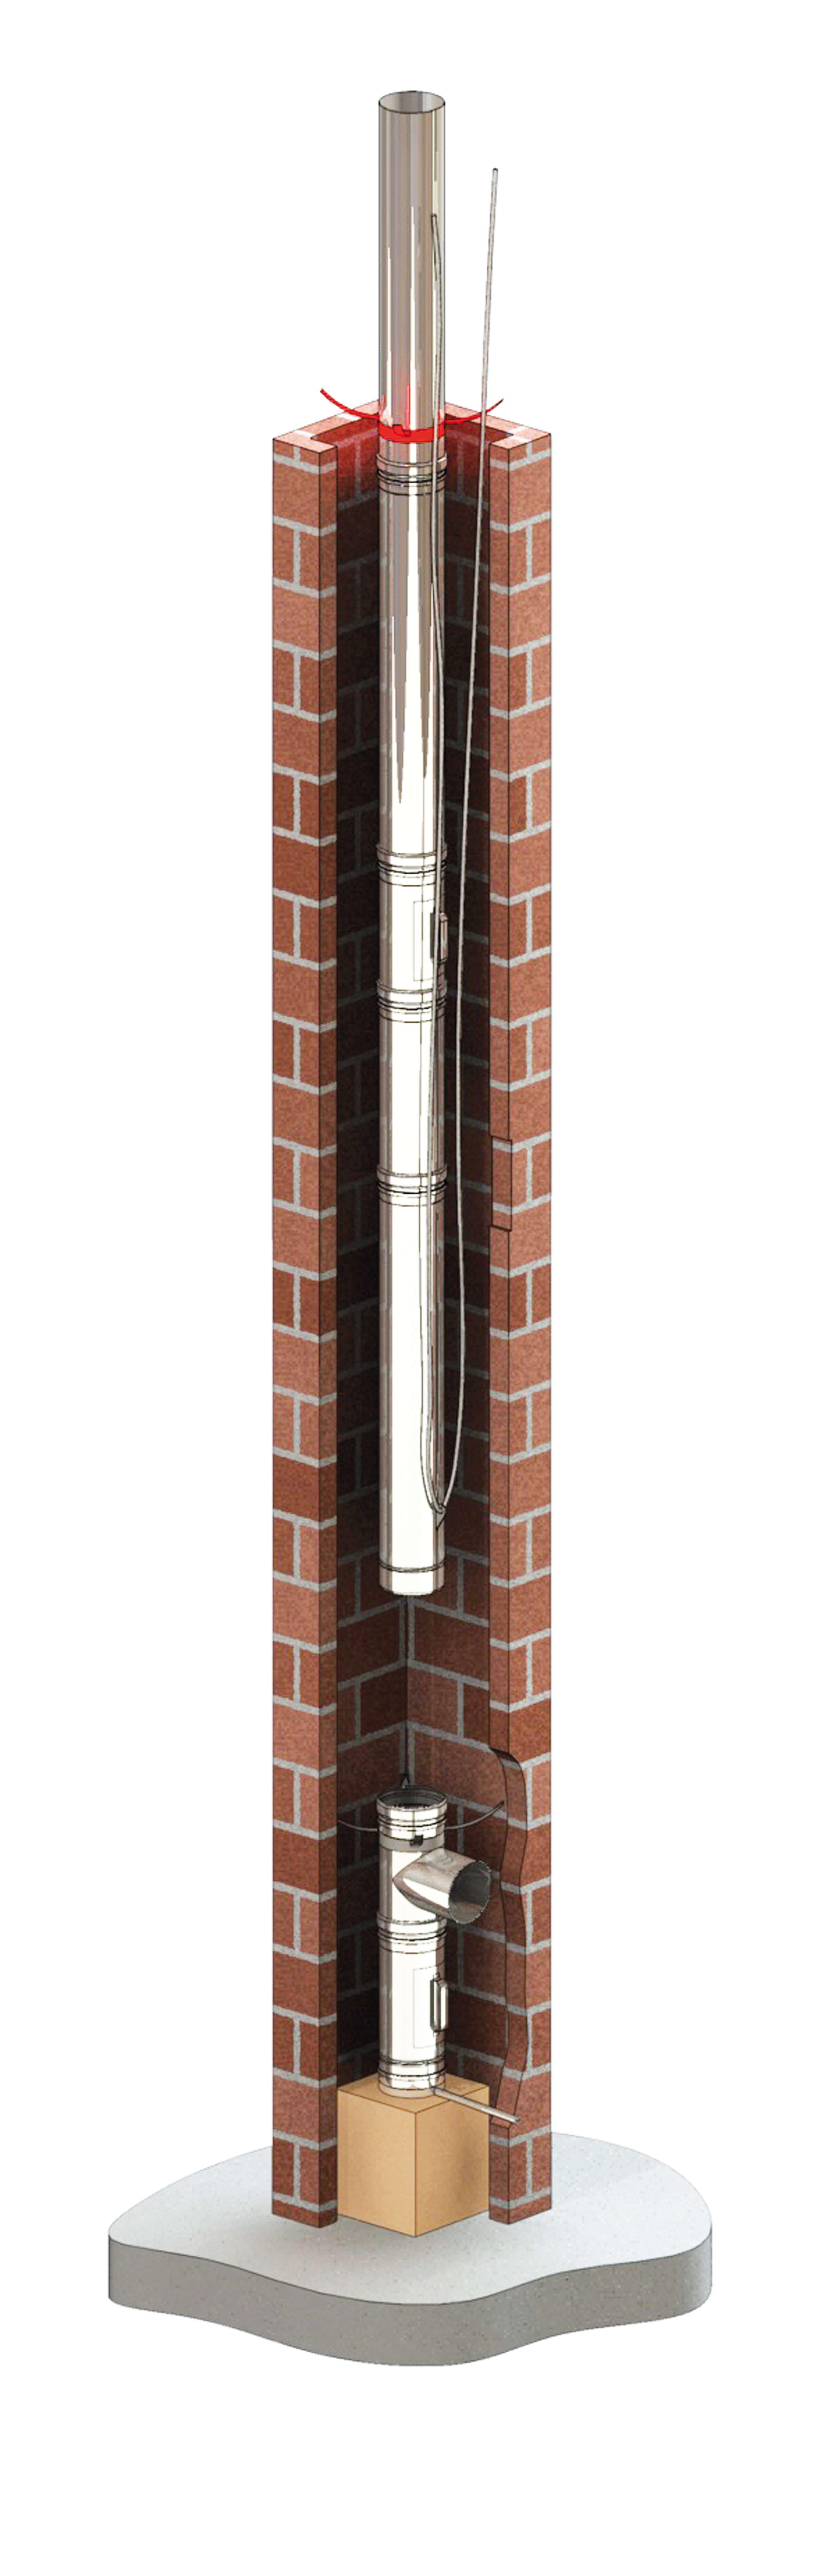 tubage-cheminee-2